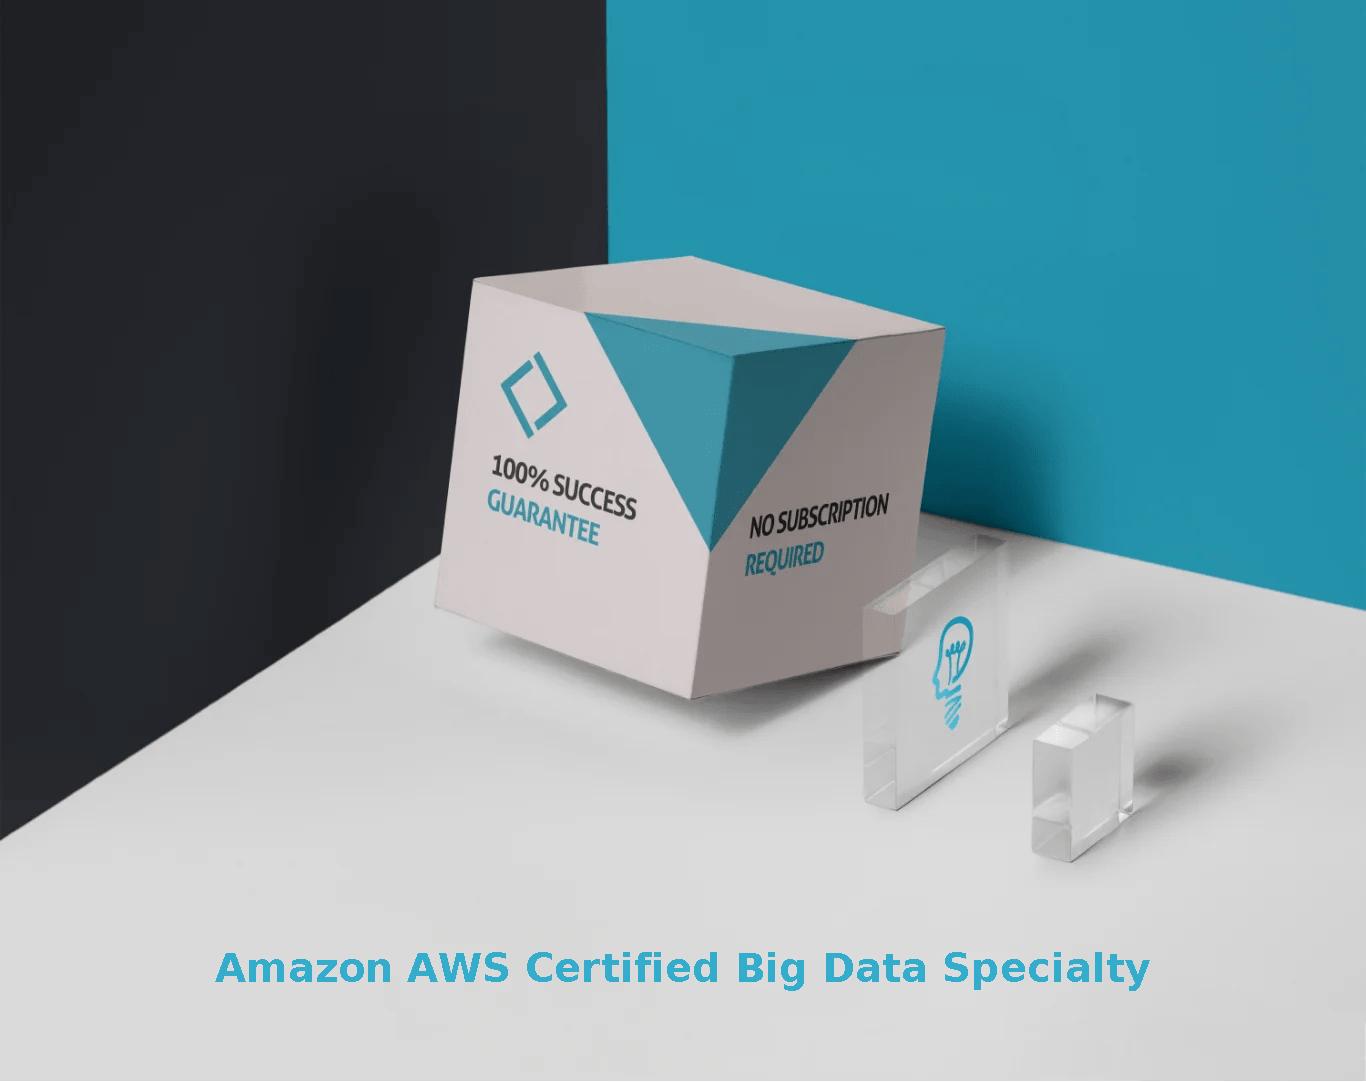 Amazon AWS Certified Big Data Specialty Exams